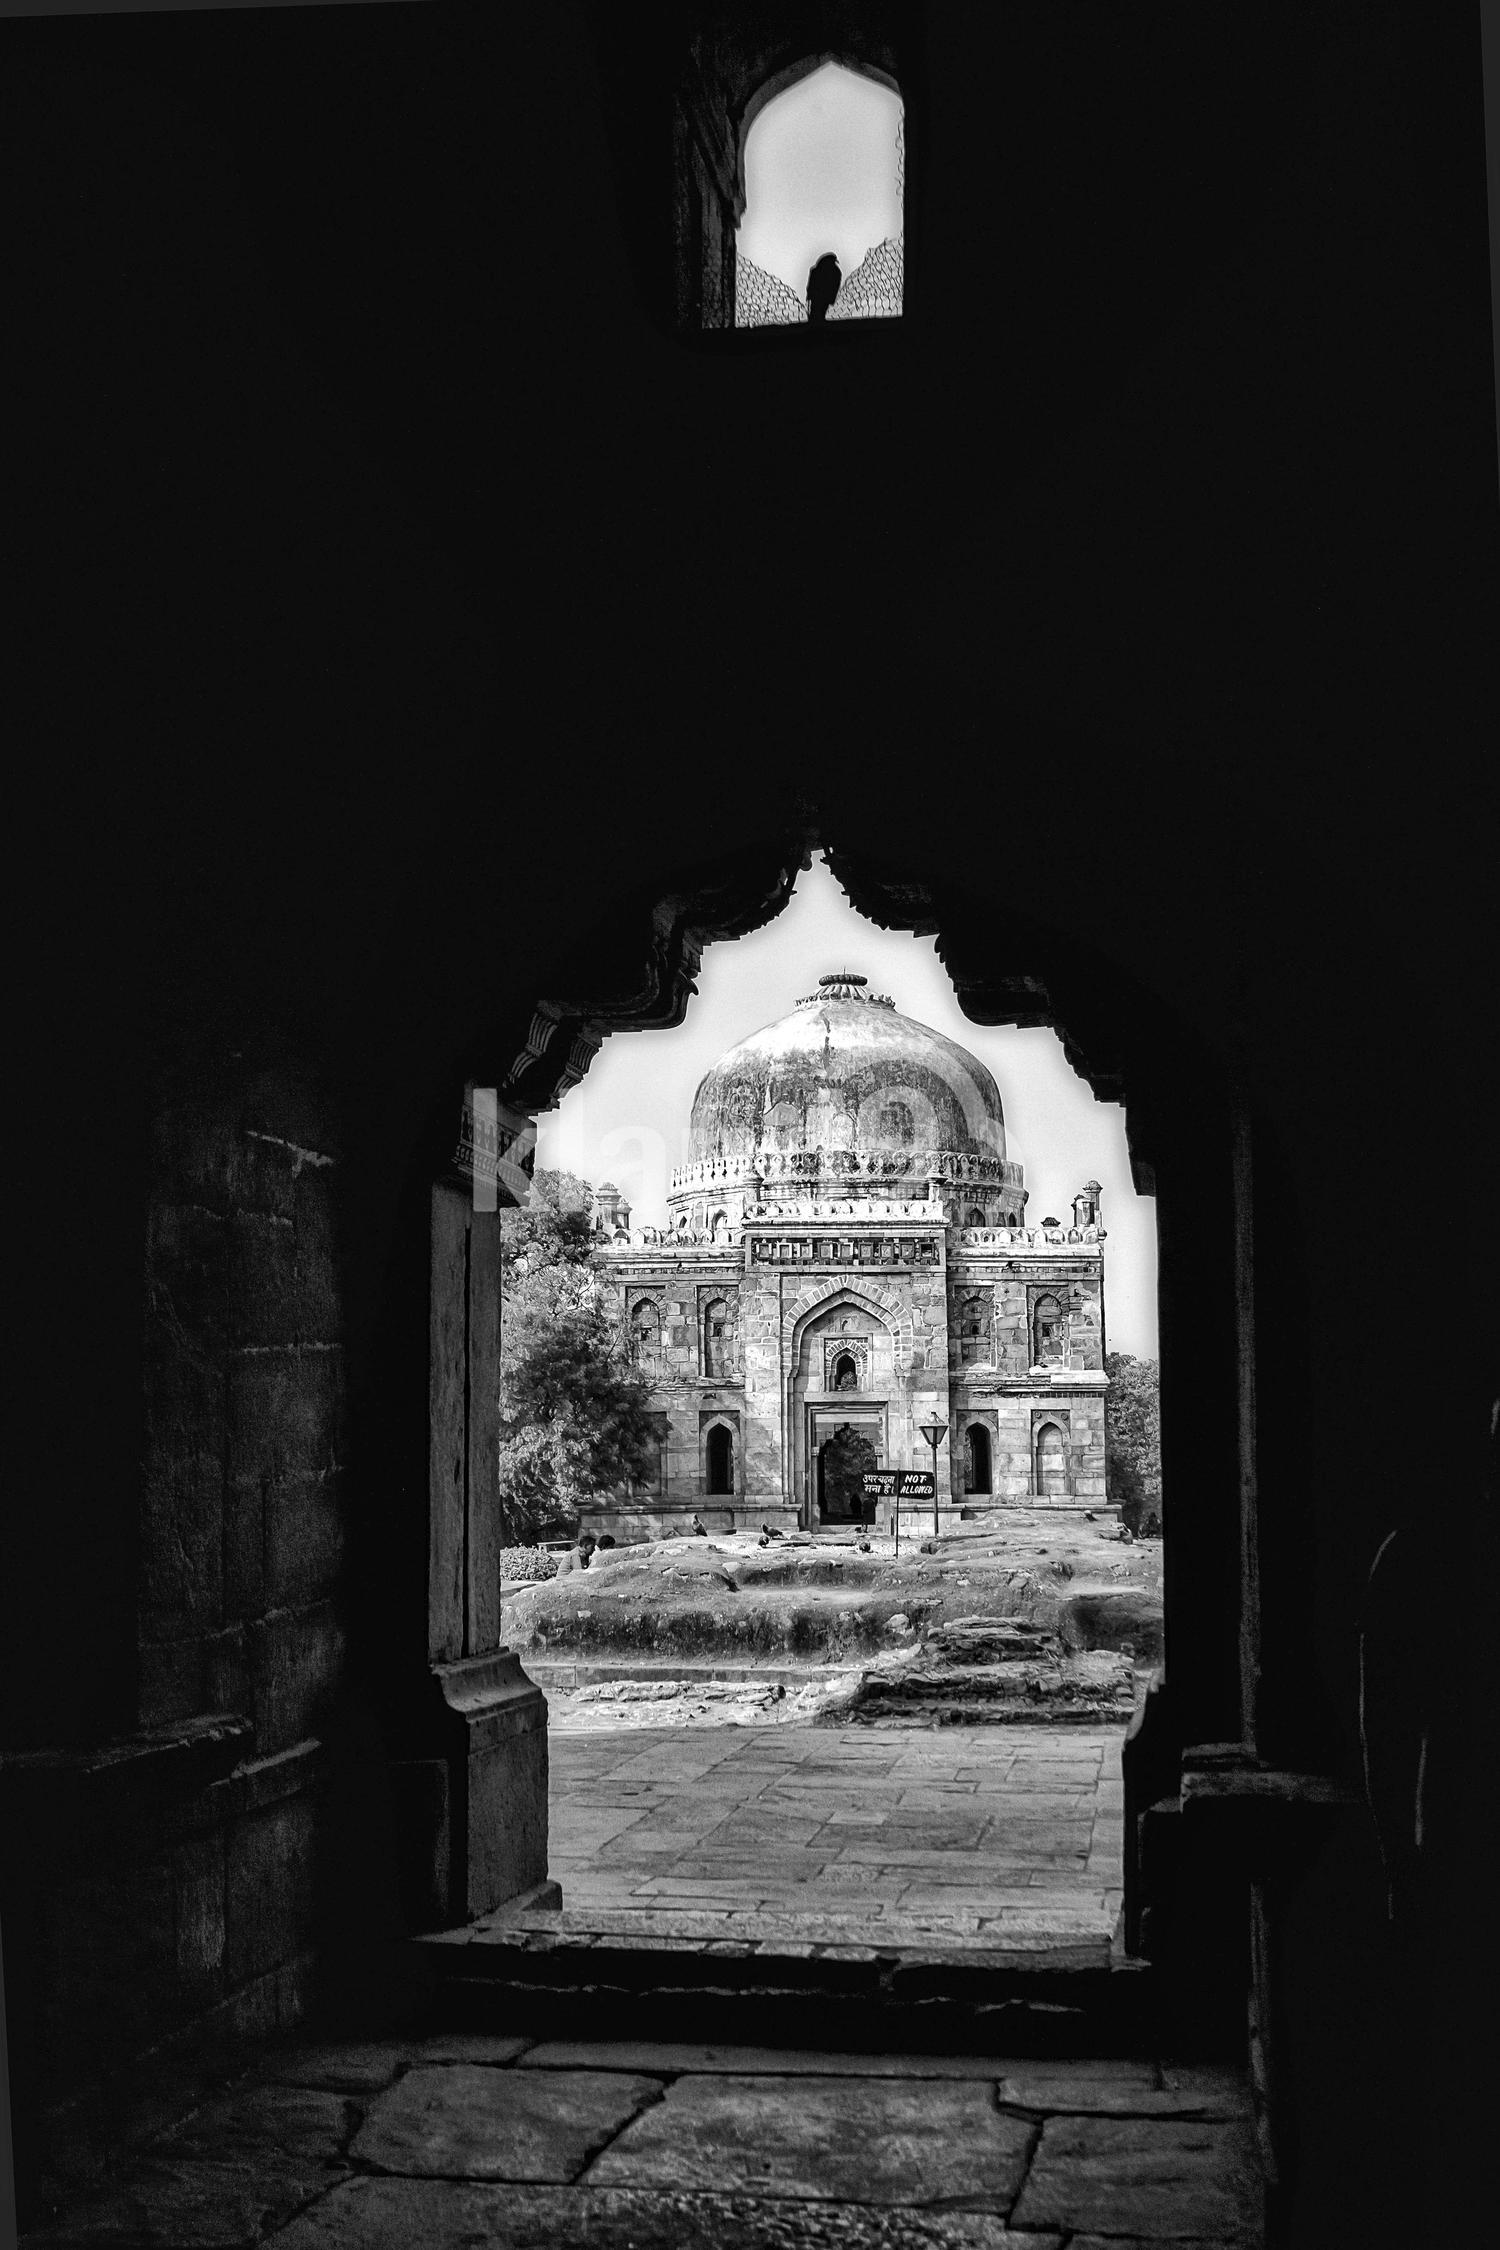 Lodhi garden, Delhi, India.